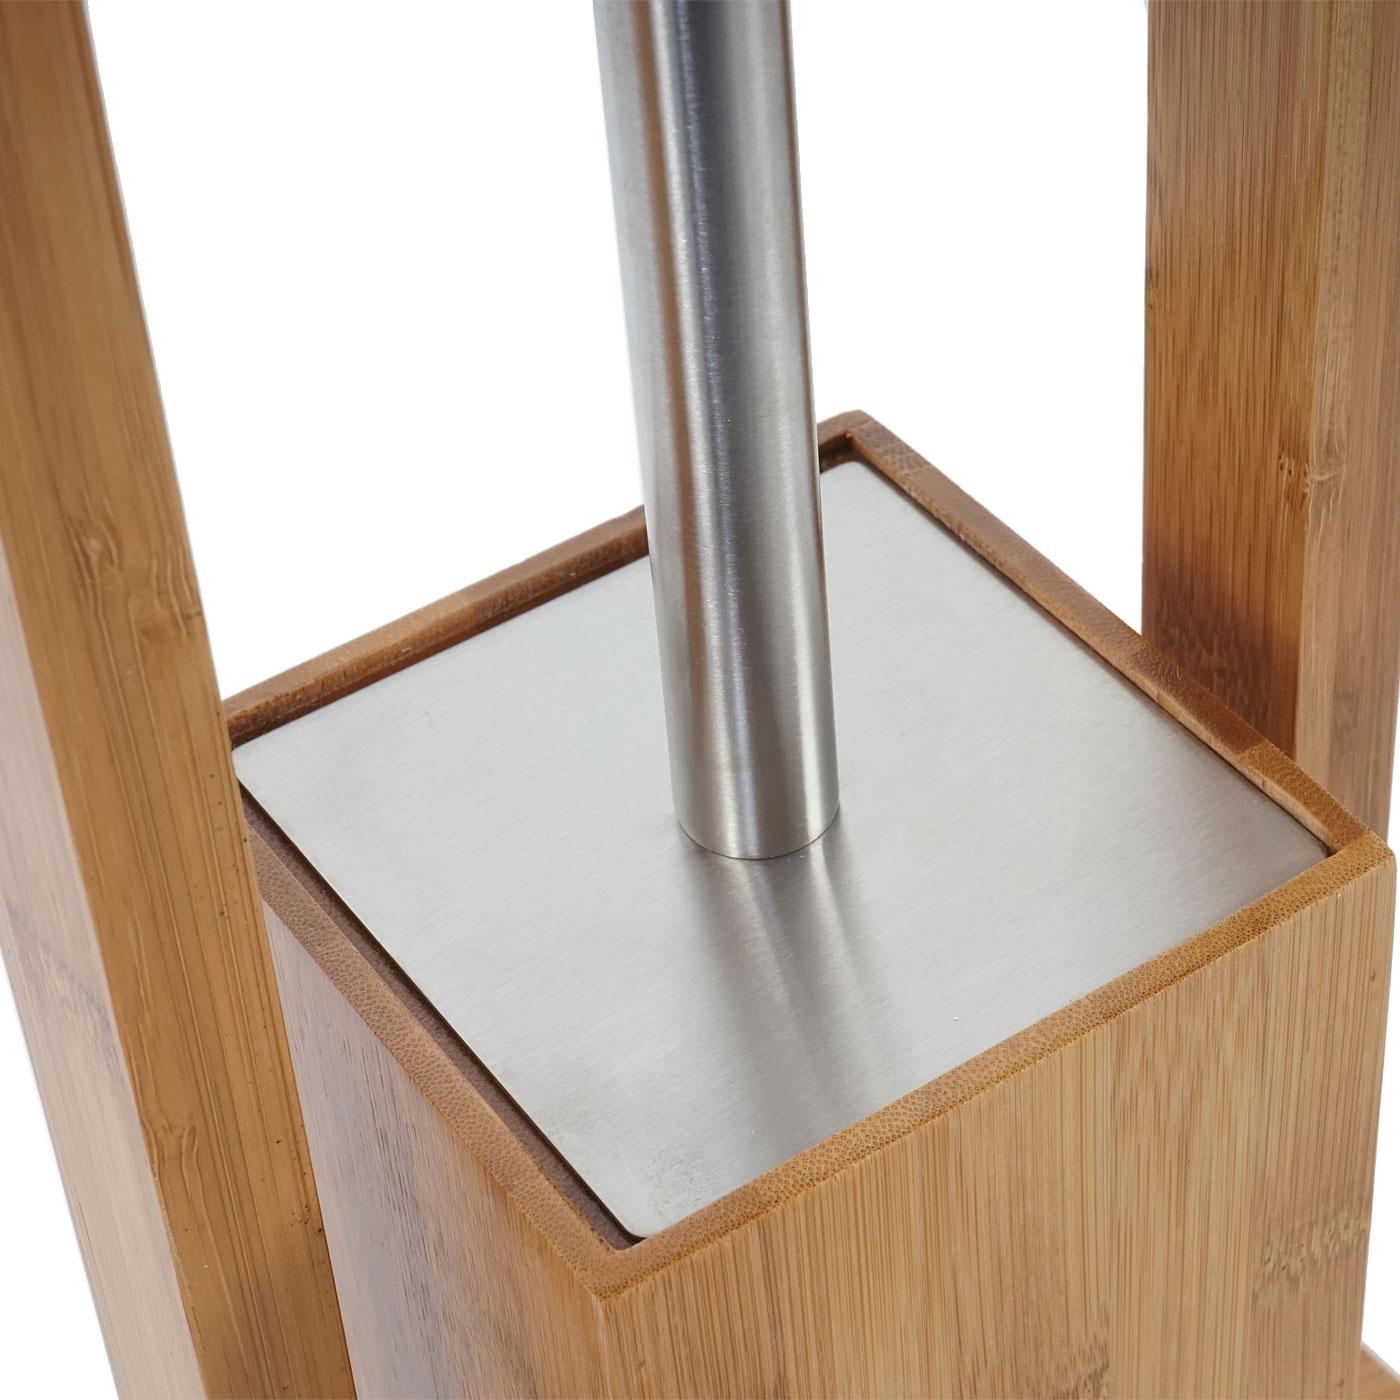 wc papierhalter klopapierhalter toilettenrollenhalter toilettenb rste bambus 4260224682376 ebay. Black Bedroom Furniture Sets. Home Design Ideas